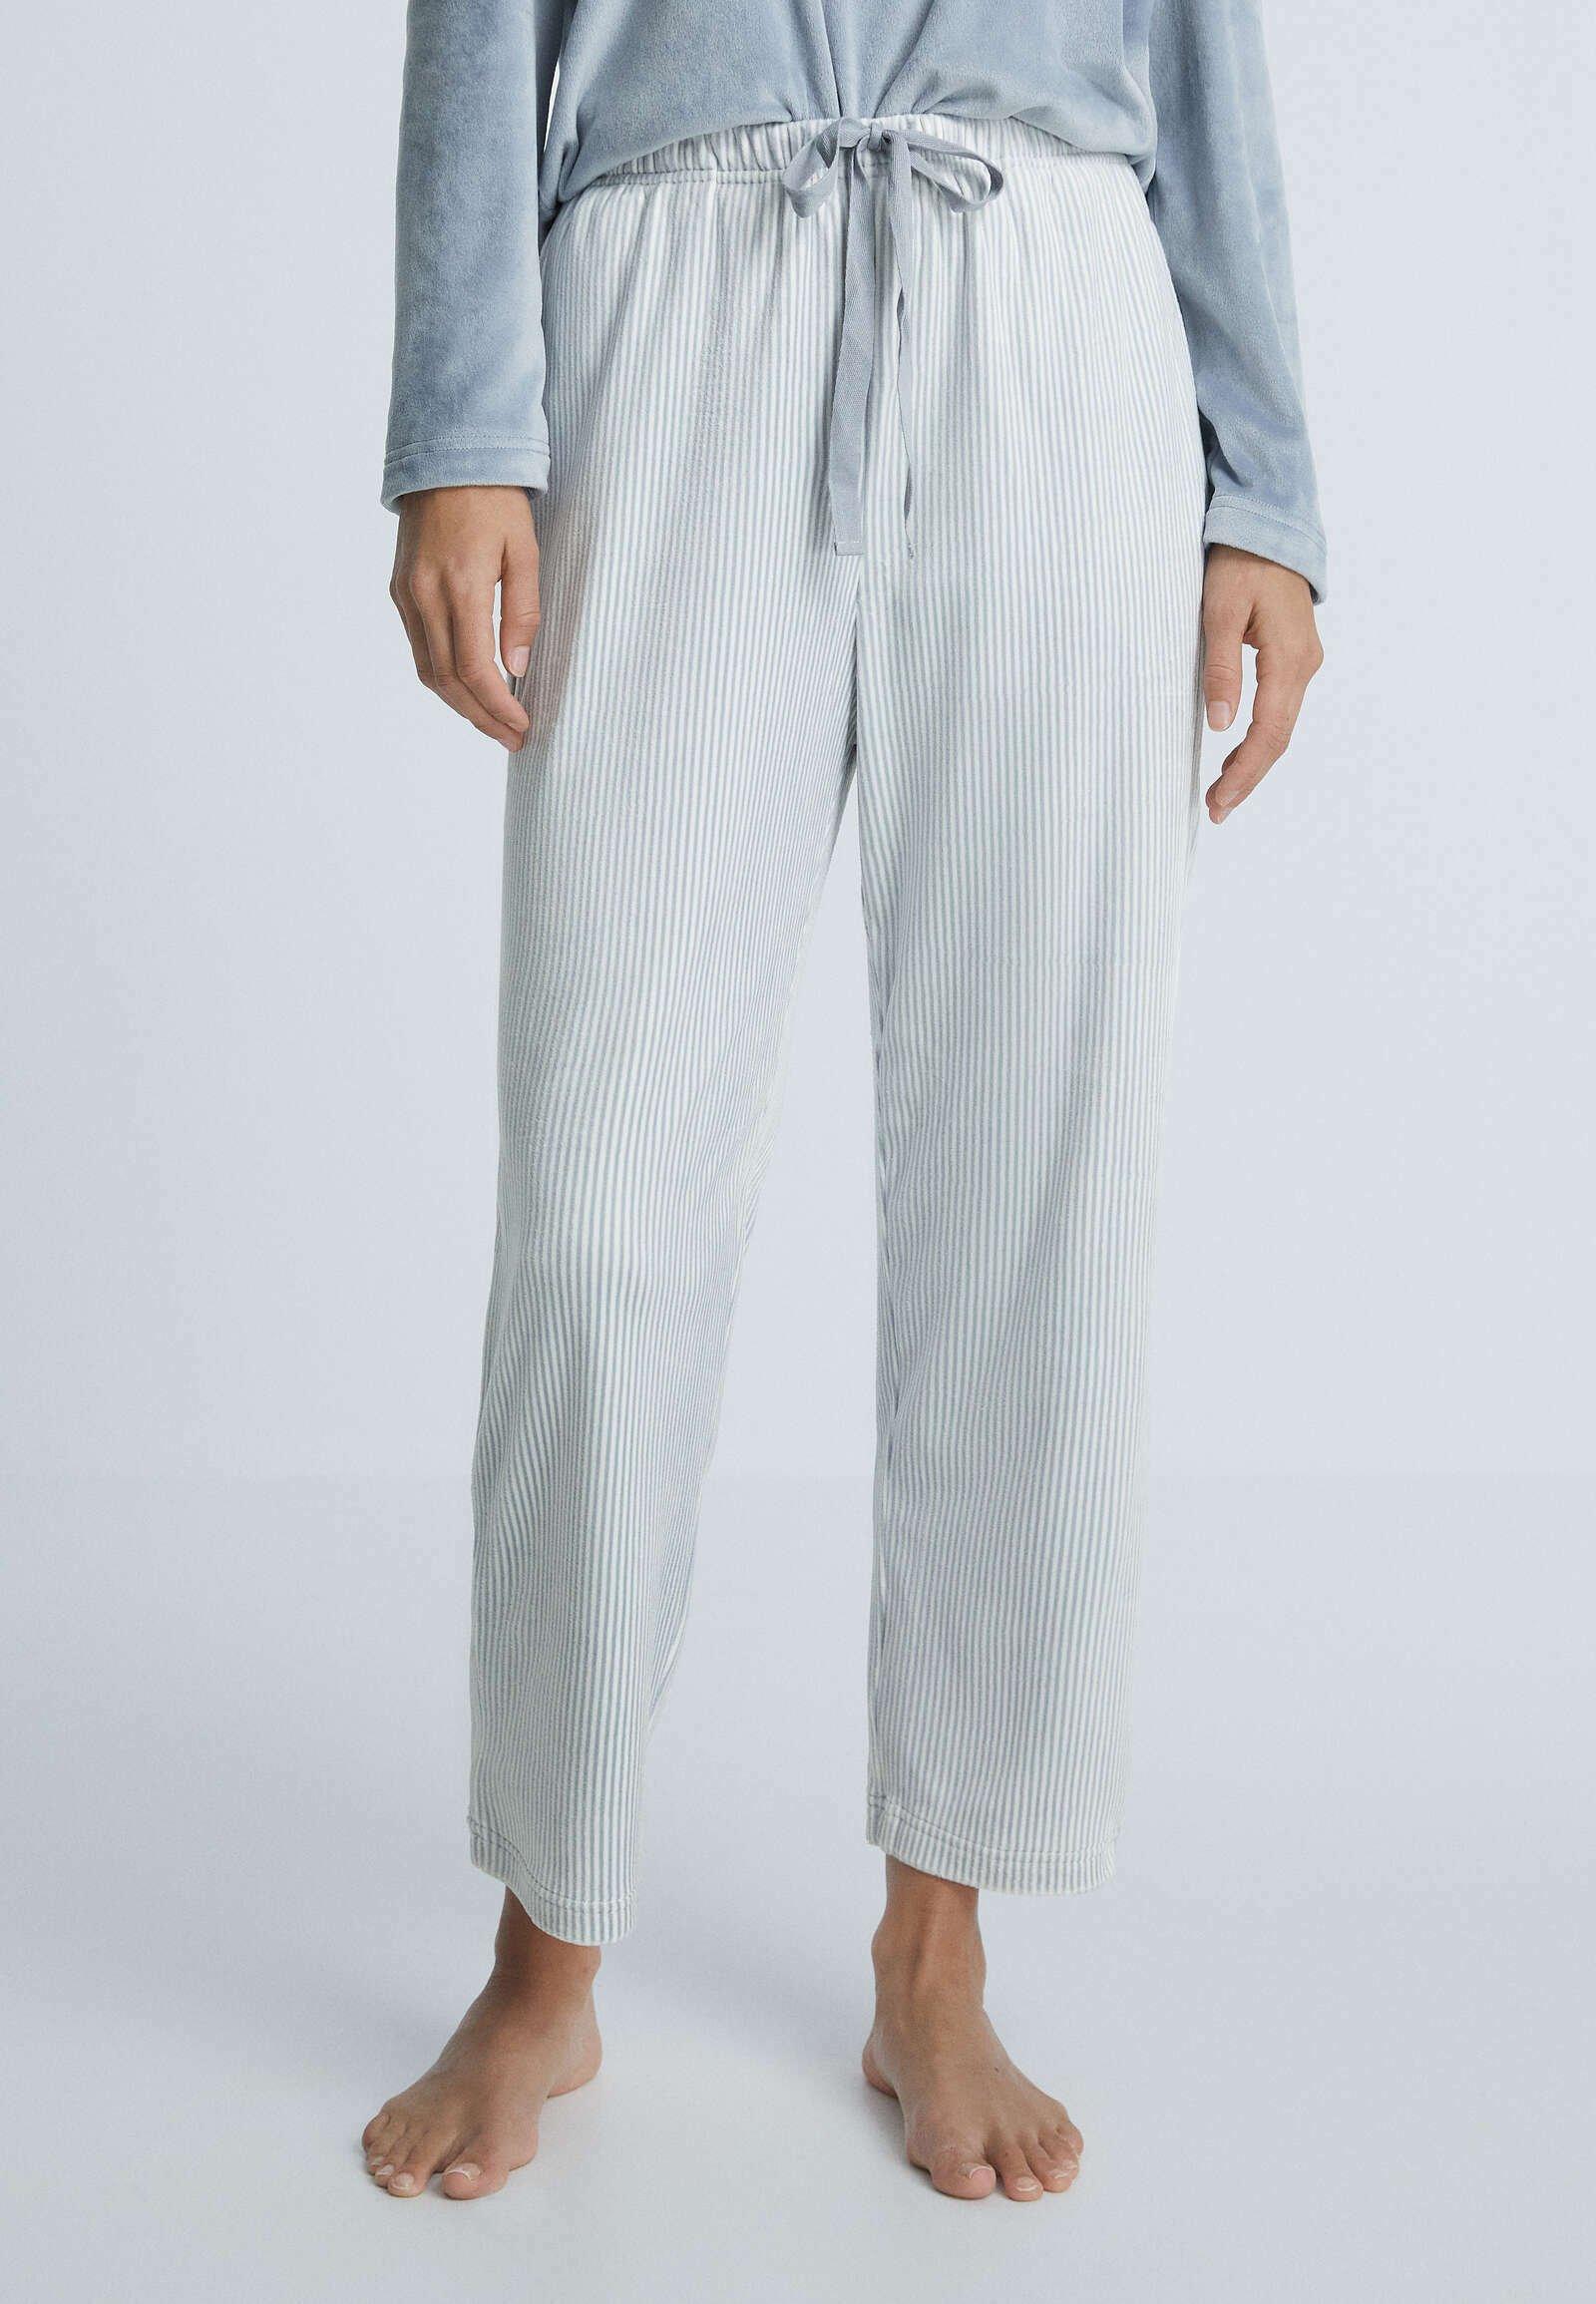 Donna SOFT TOUCH VELOUR - Pantaloni del pigiama